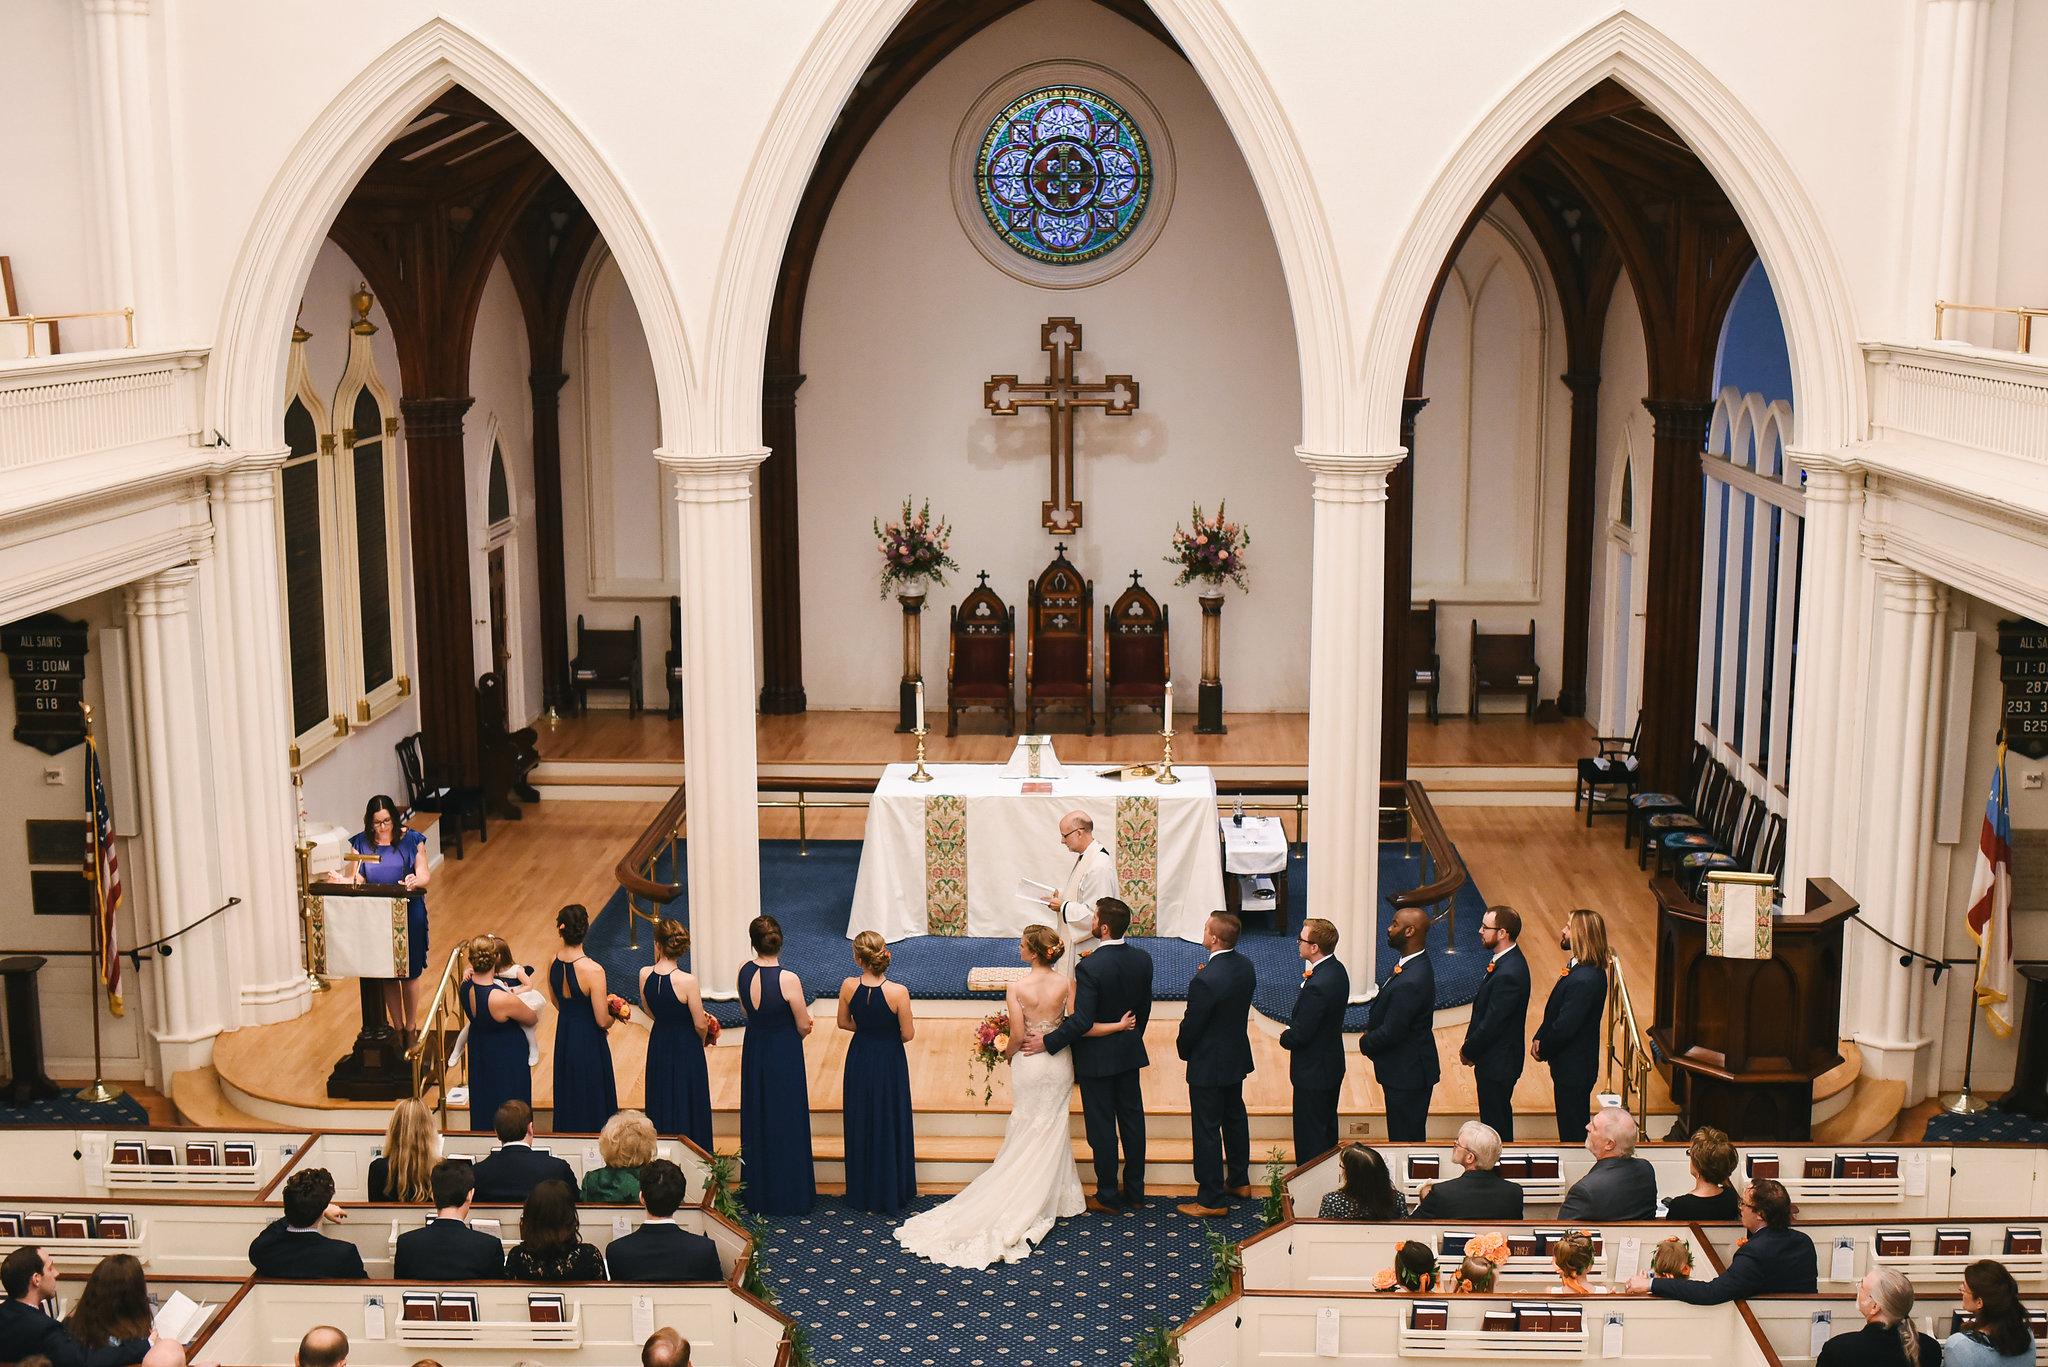 Alexandria, DC, Jos A. Bank Suit, The Enchanted Florist, Wedding Party, Bridal Party, Lian Carlo Wedding Dress, Blue Bridesmaid Dress, St. Paul's Episcopal Church, Church Wedding, Ceremony, Classic